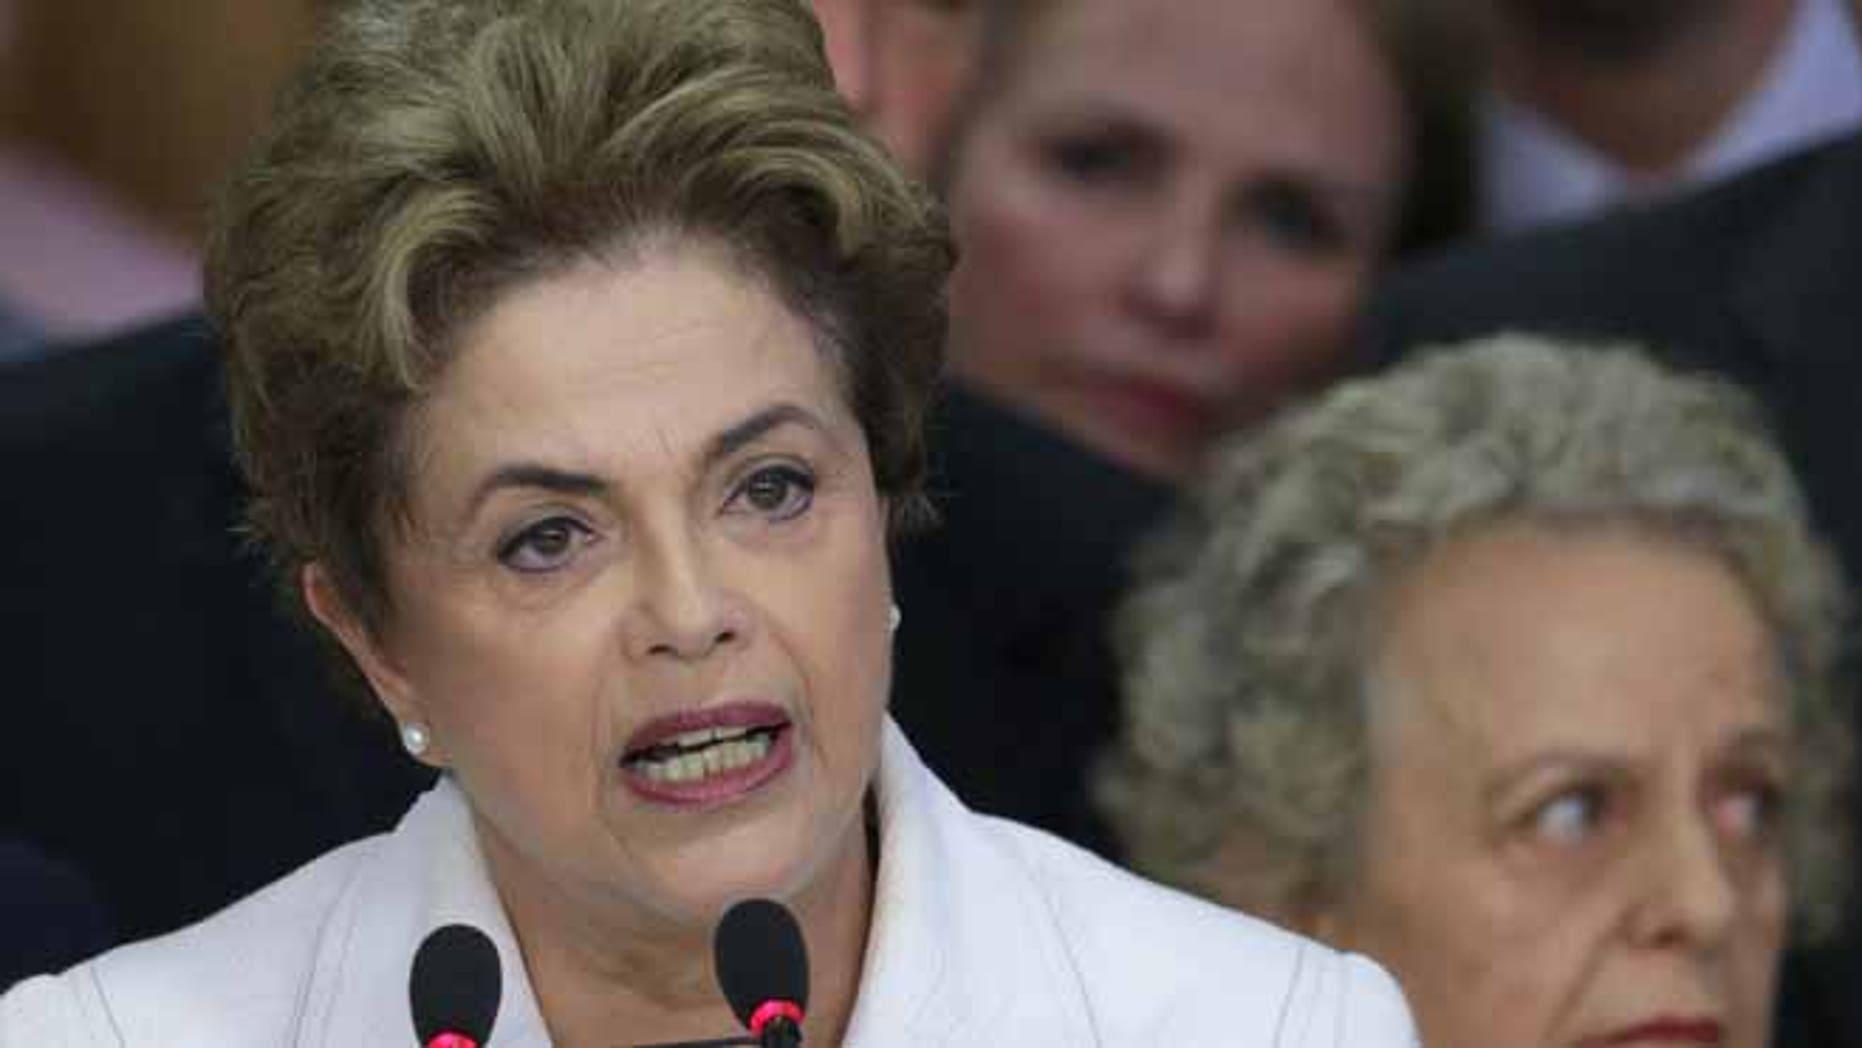 Brazil's President Dilma Rousseff addresses the nation at Planalto presidential palace in Brasilia, Brazil, Thursday, May 12, 2016.